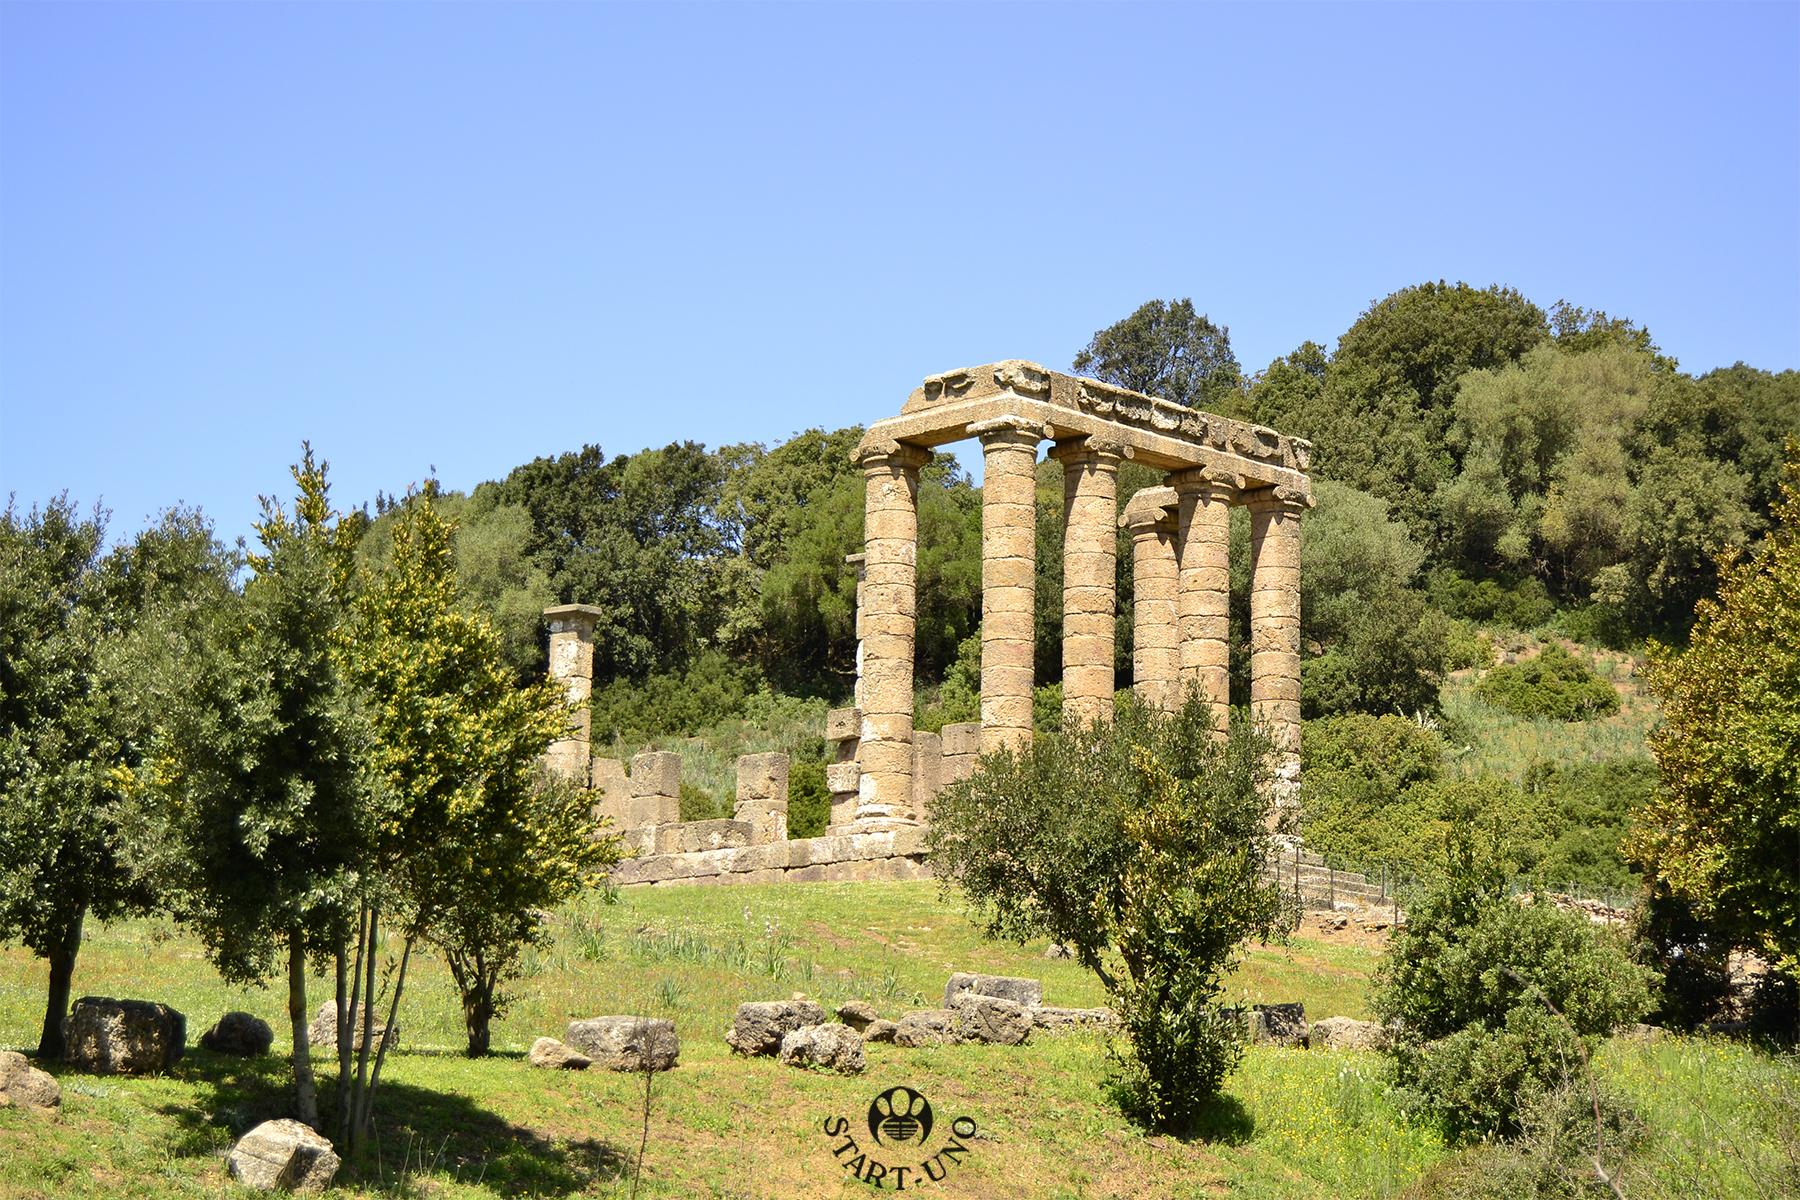 1_Antas_Tempio Romano statica